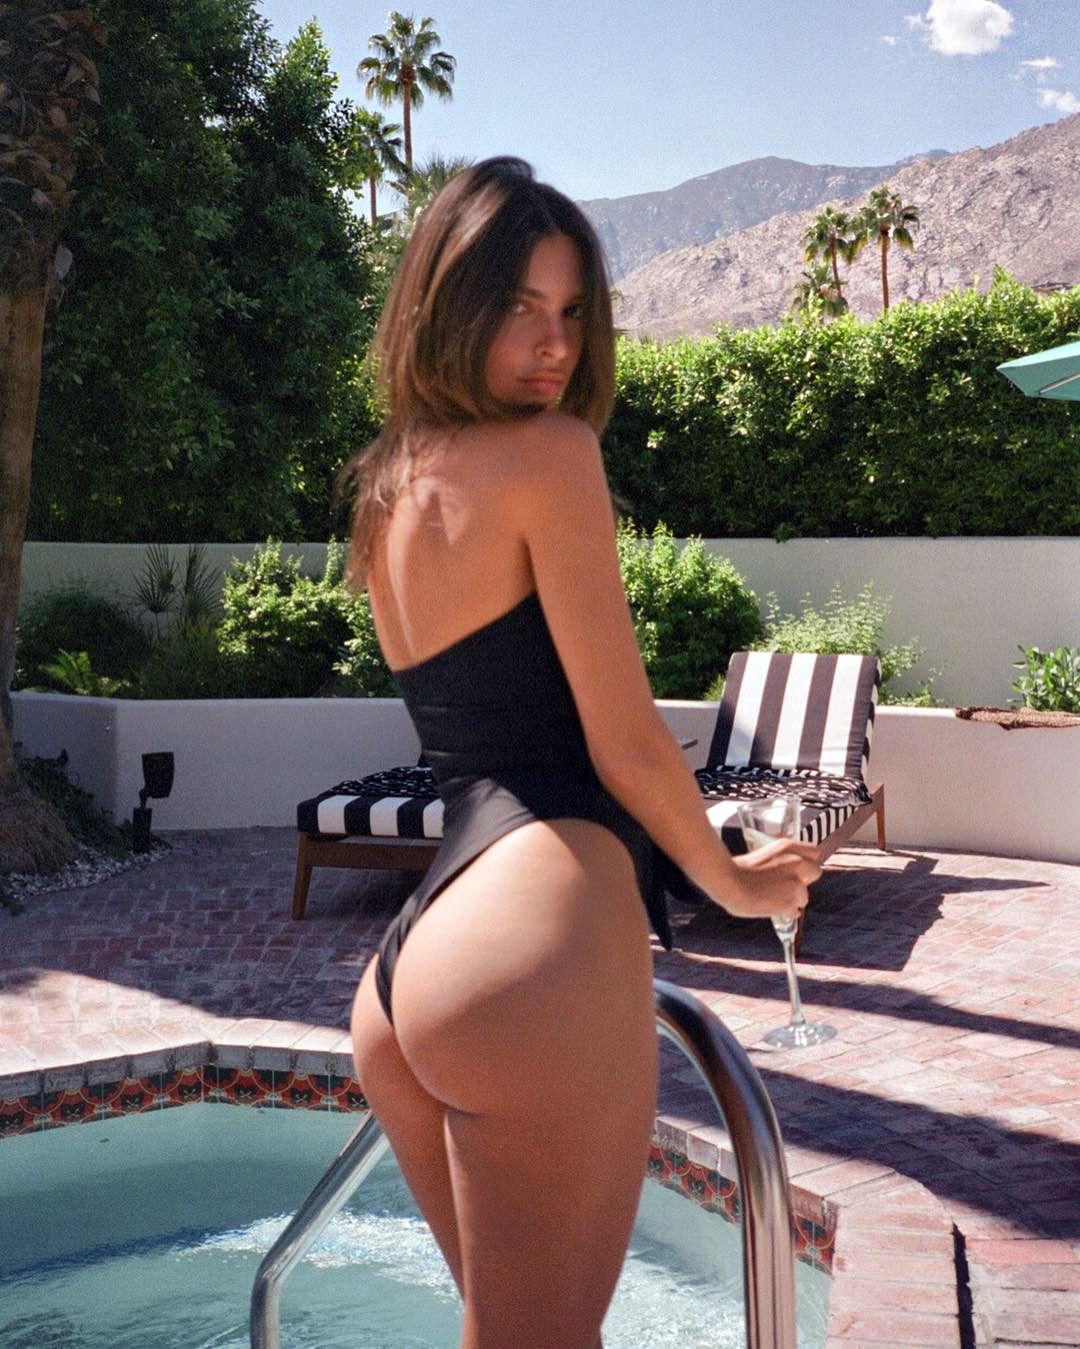 0919035923252_0_Emily-Ratajkowski-Sexy-Hot-1-thefappeningblog.com_.jpg